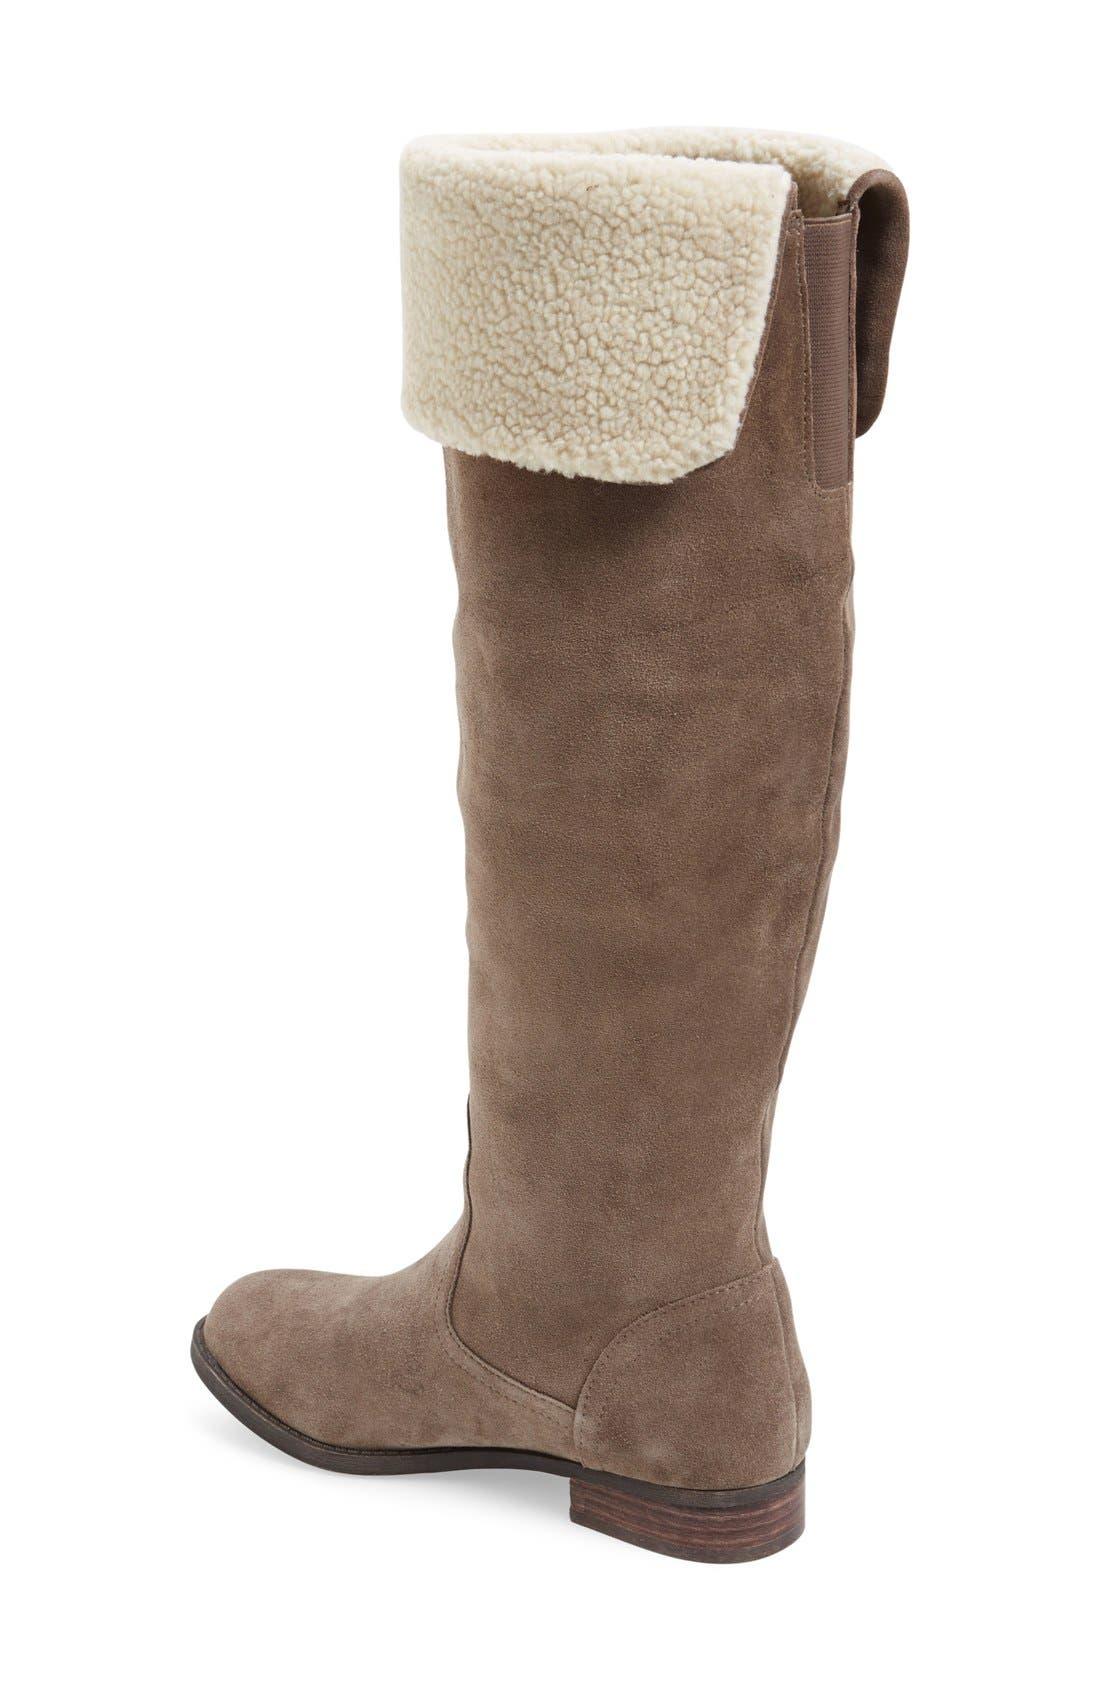 Alternate Image 2  - Sole Society 'Lanee' Tall Boot (Women)